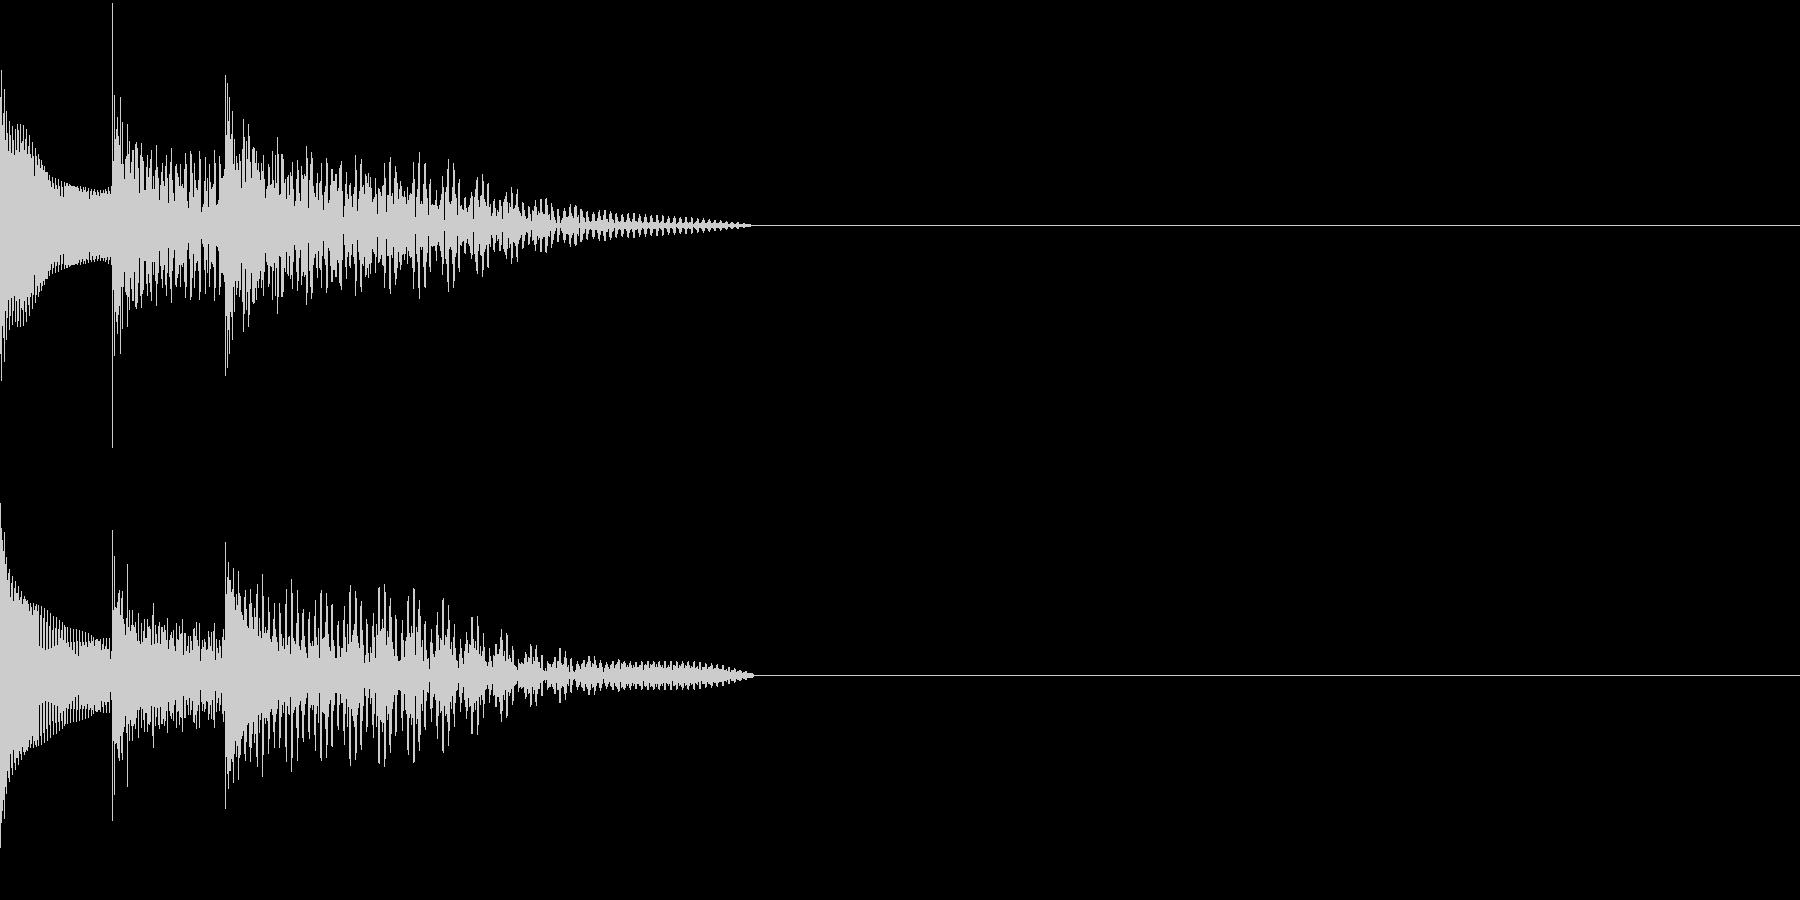 Cursor セレクト・カーソルの音15の未再生の波形